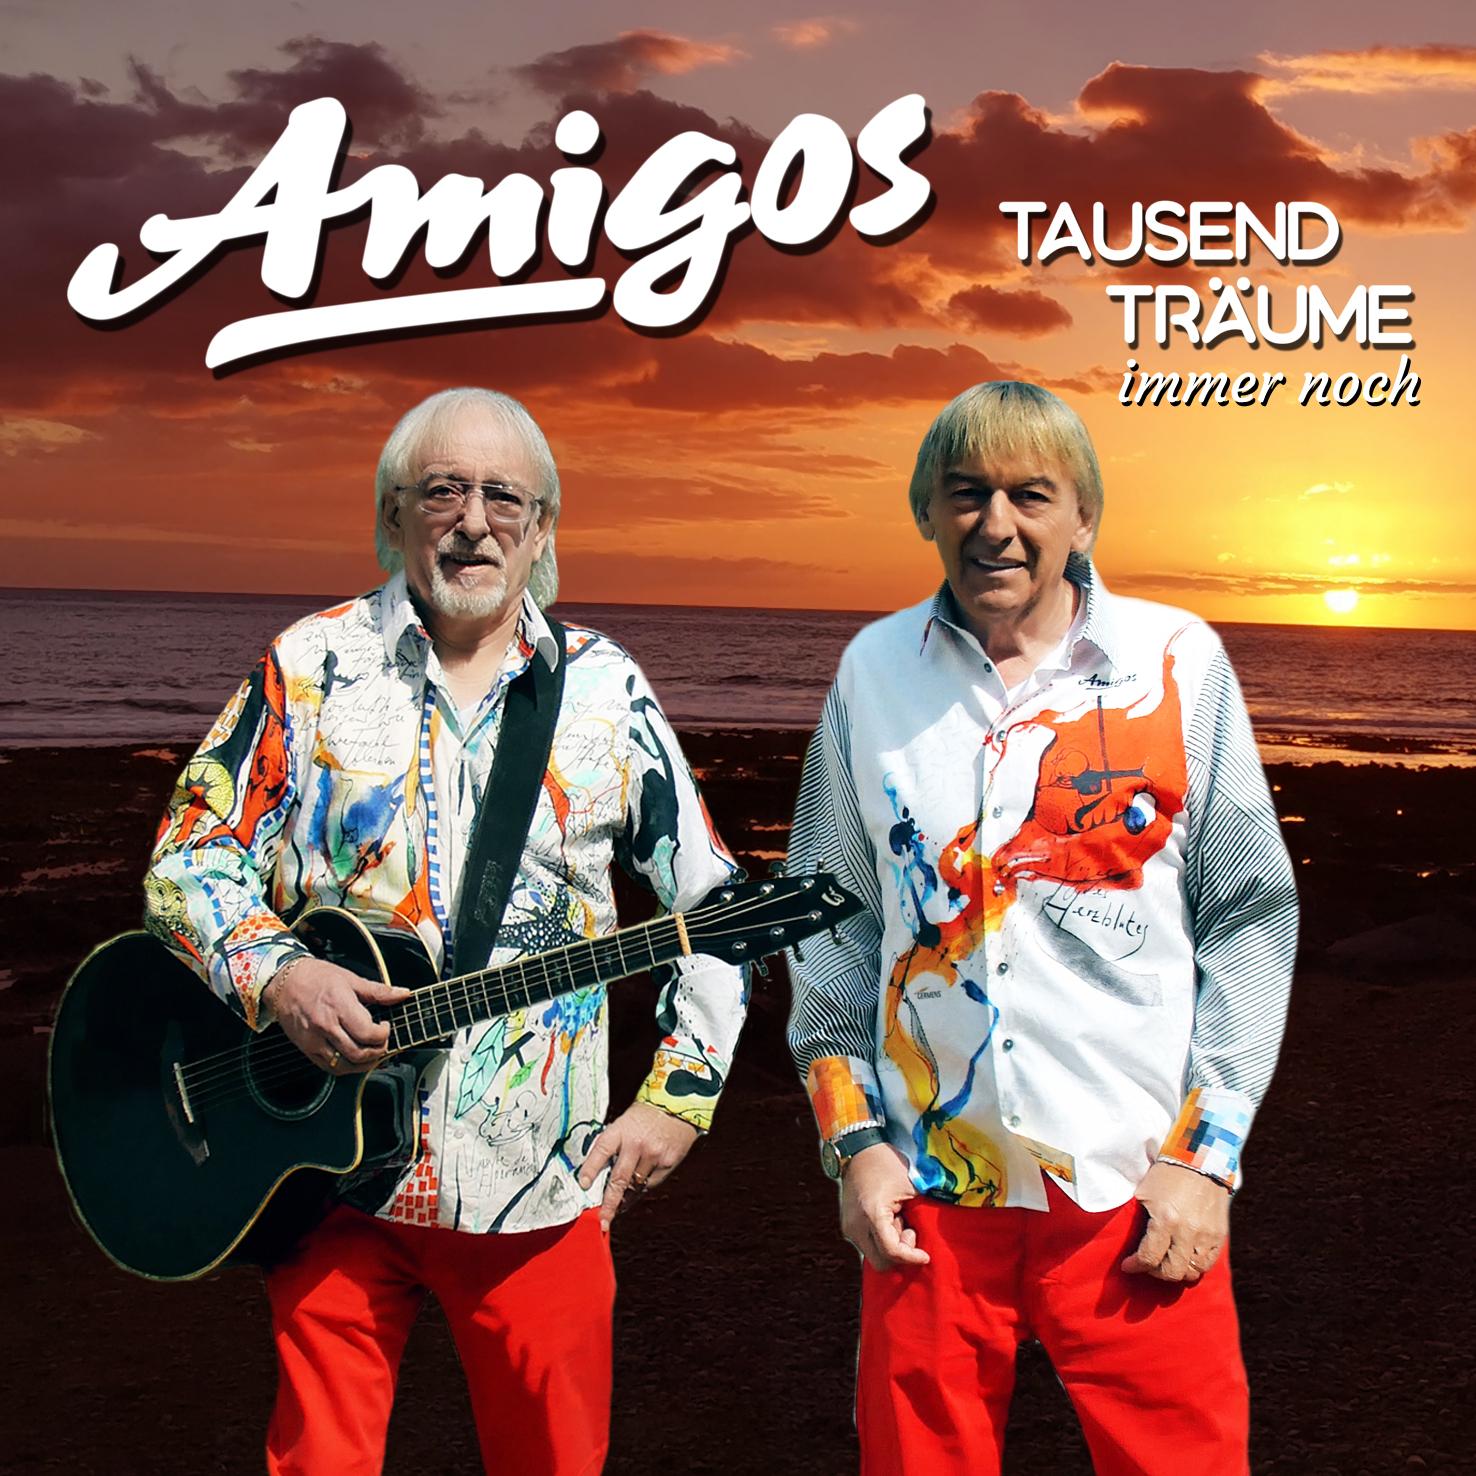 Amigos - Tausend Träume immer noch (2020) Cover